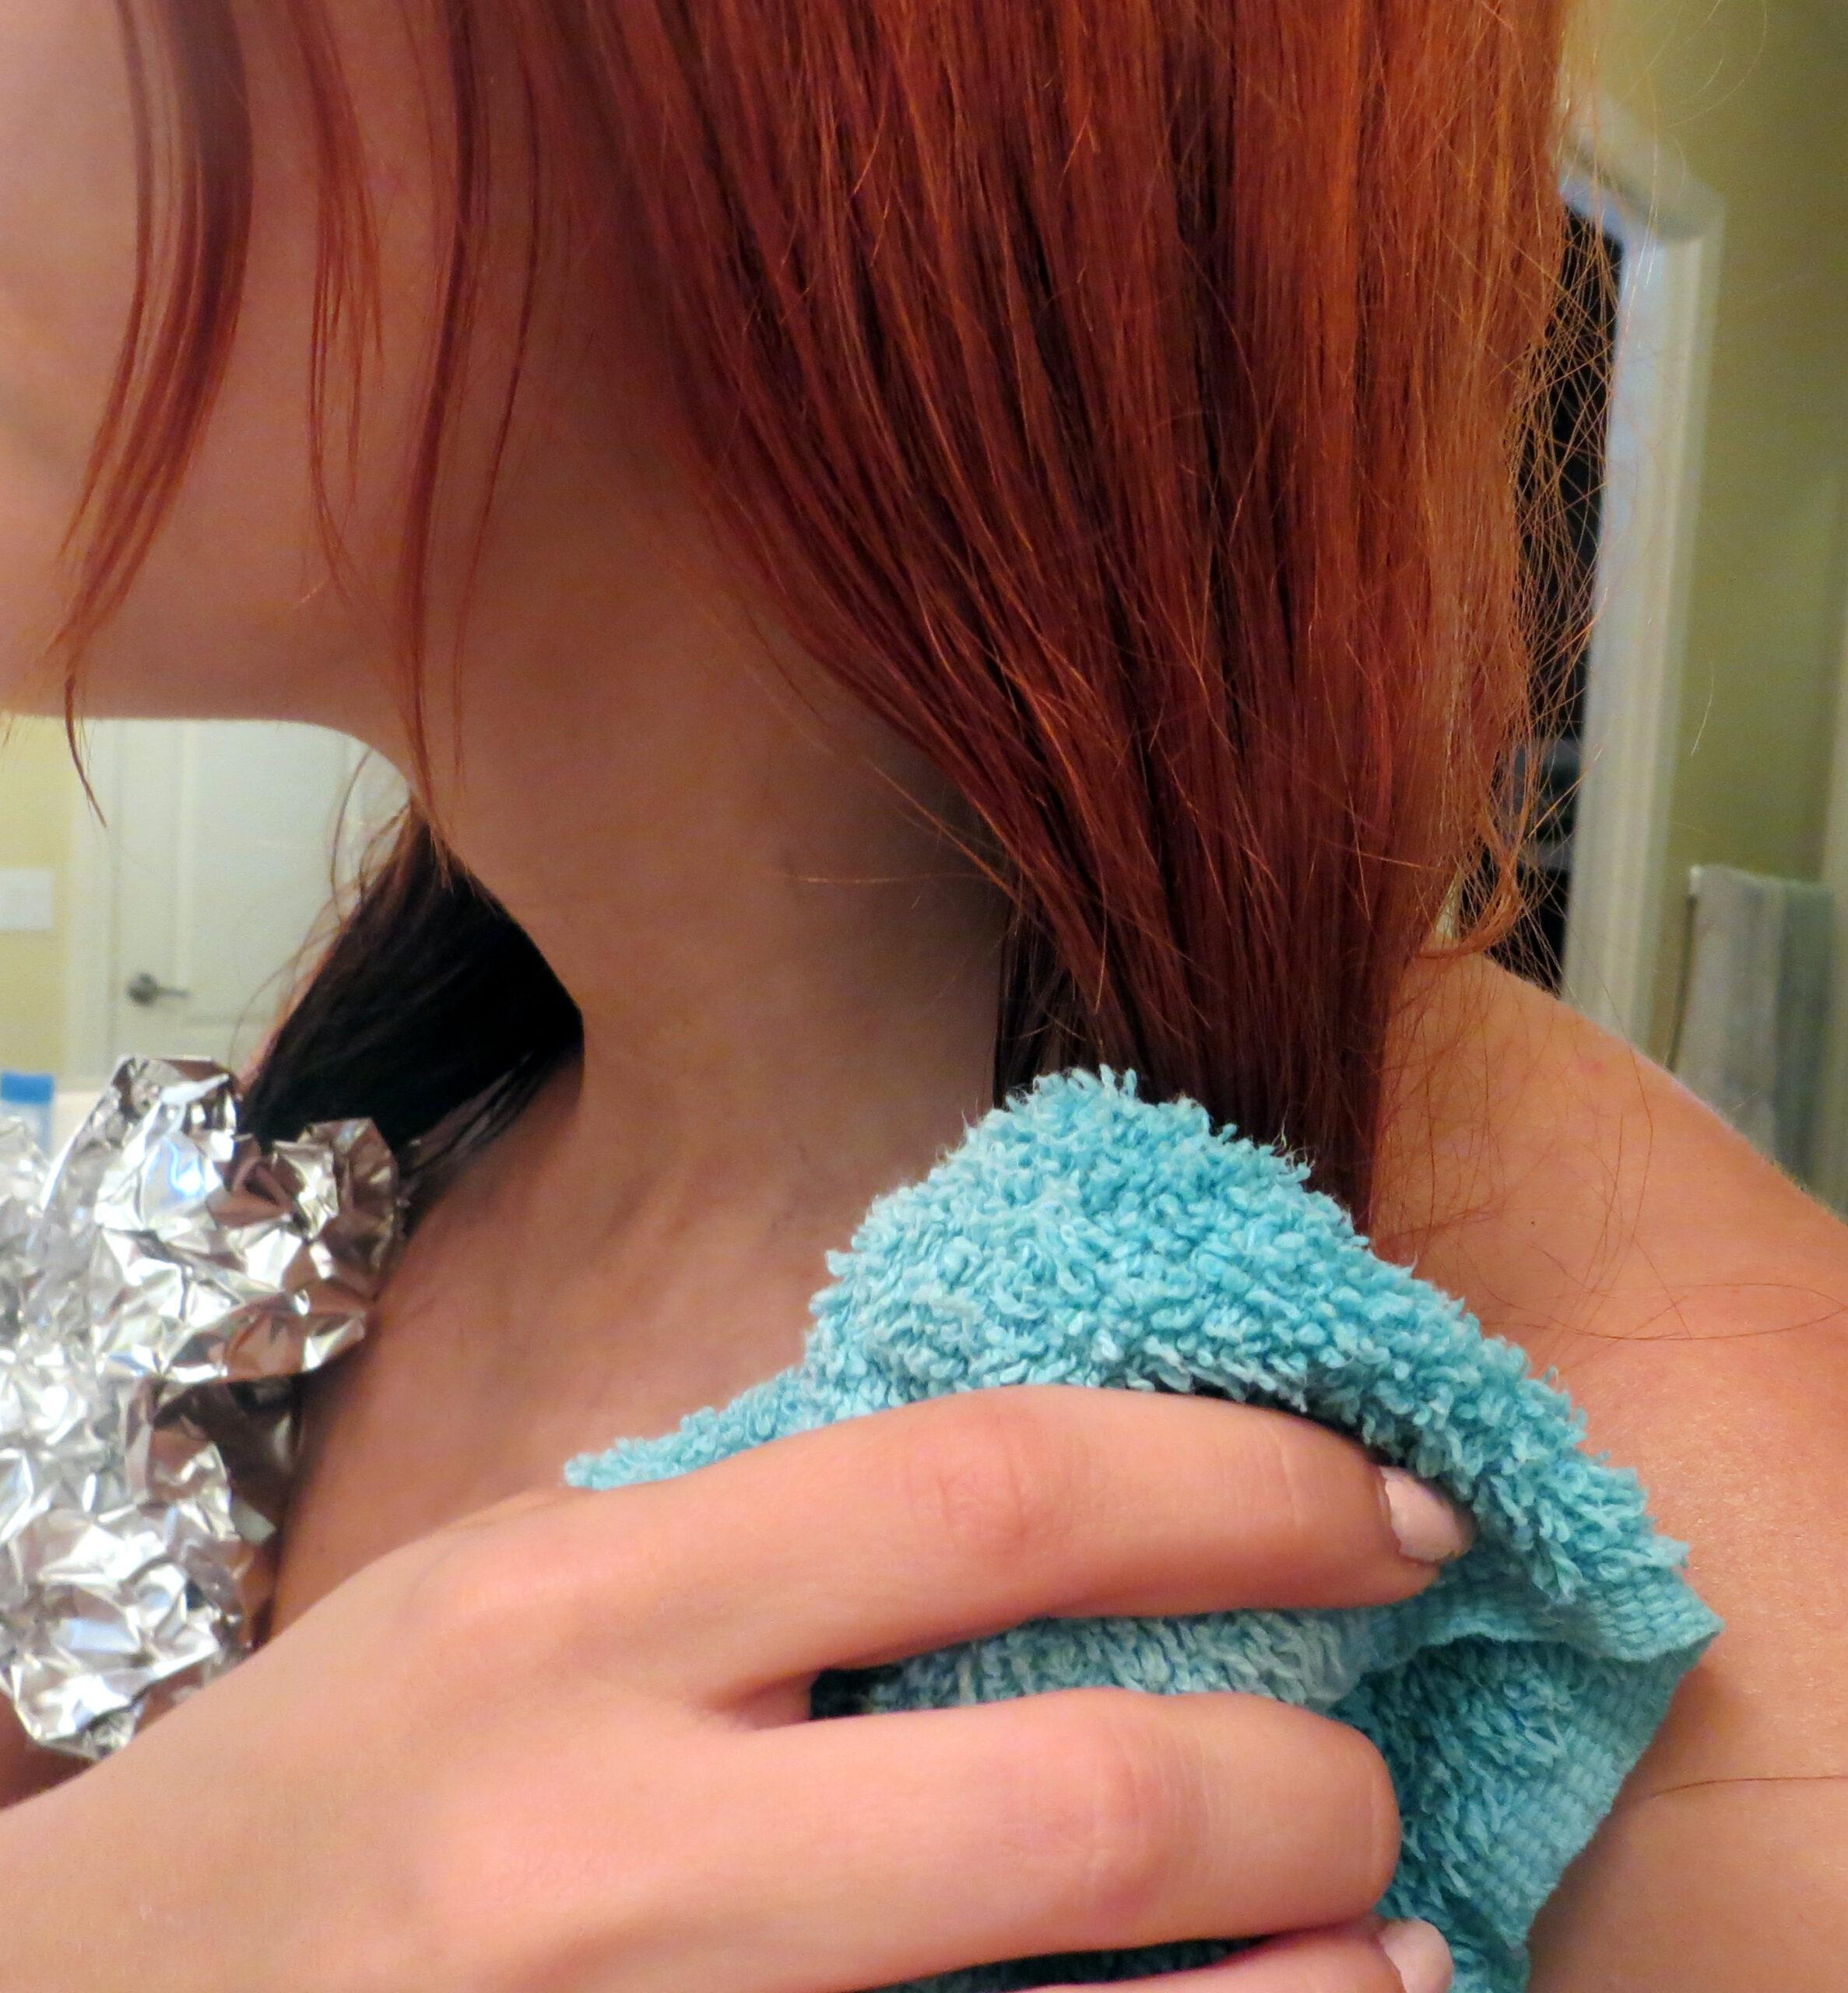 Dip Dye Ombre Hair DIY How To Tutorial: The Washcloth Method